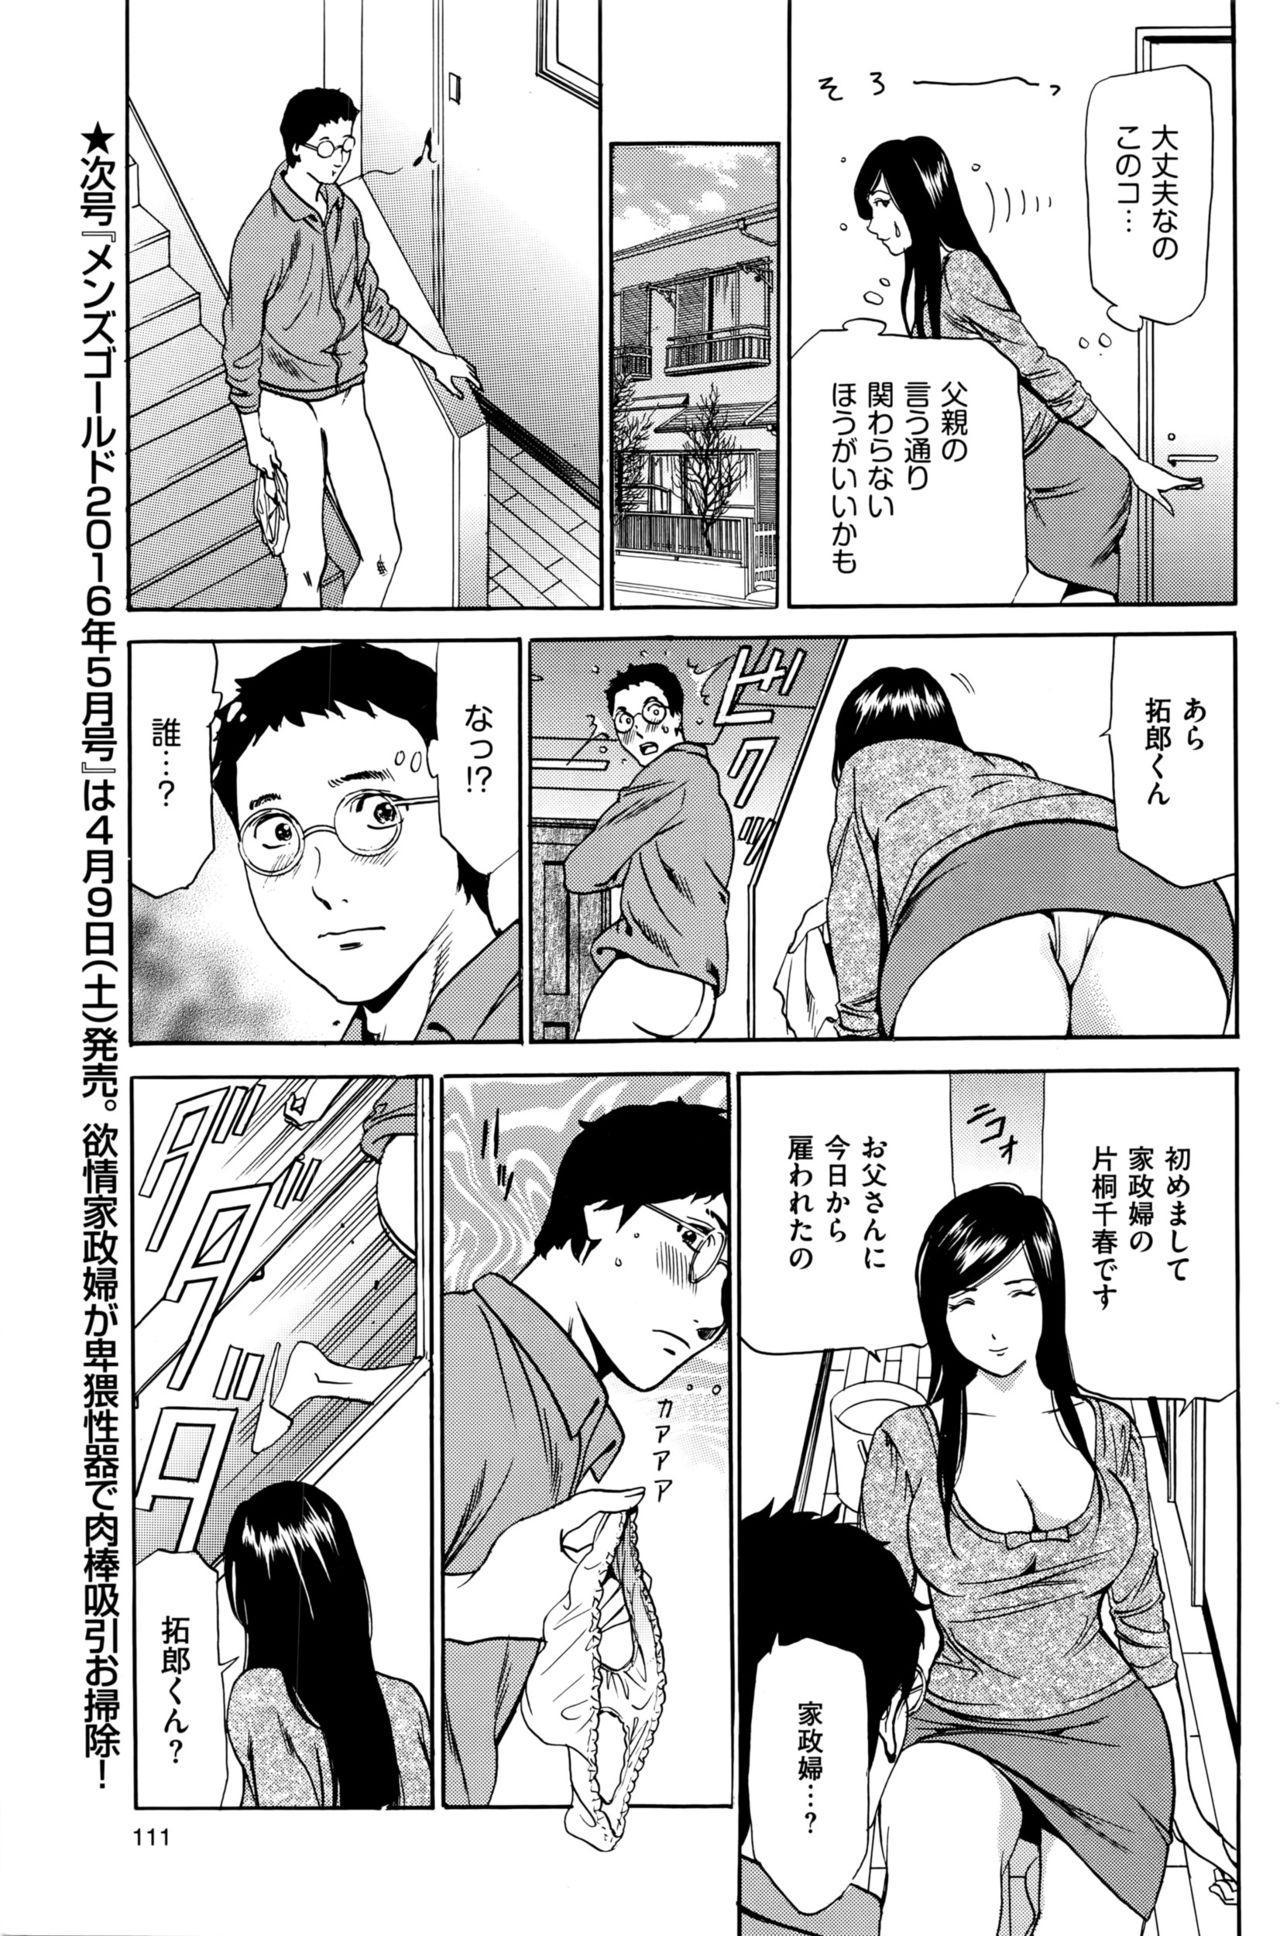 Wa Usuki Ipa a 1-10 23